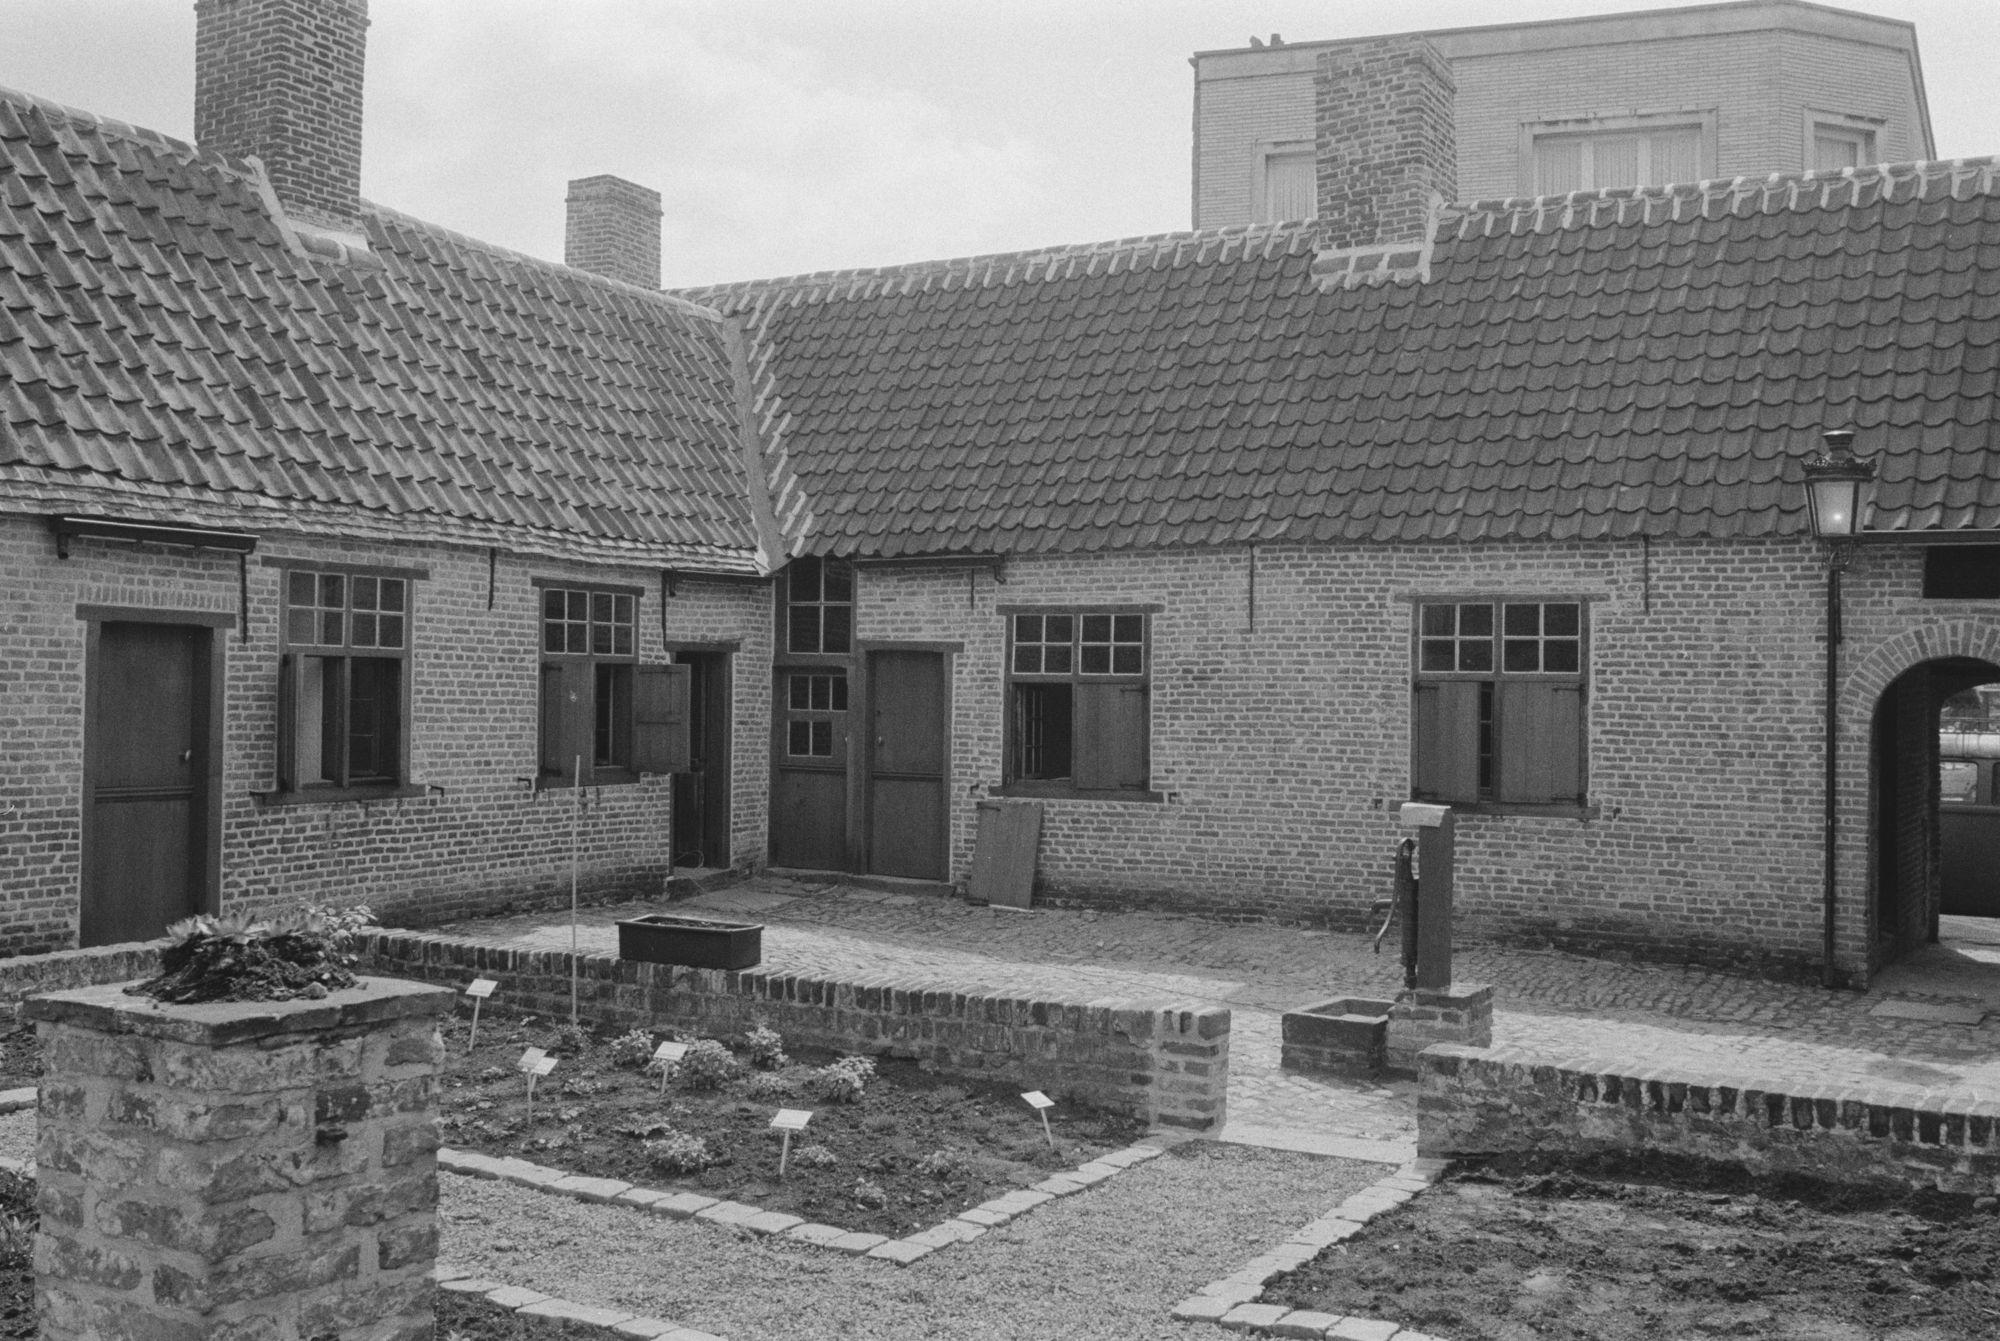 Baggaertshof in de Sint-jansstraat 1981